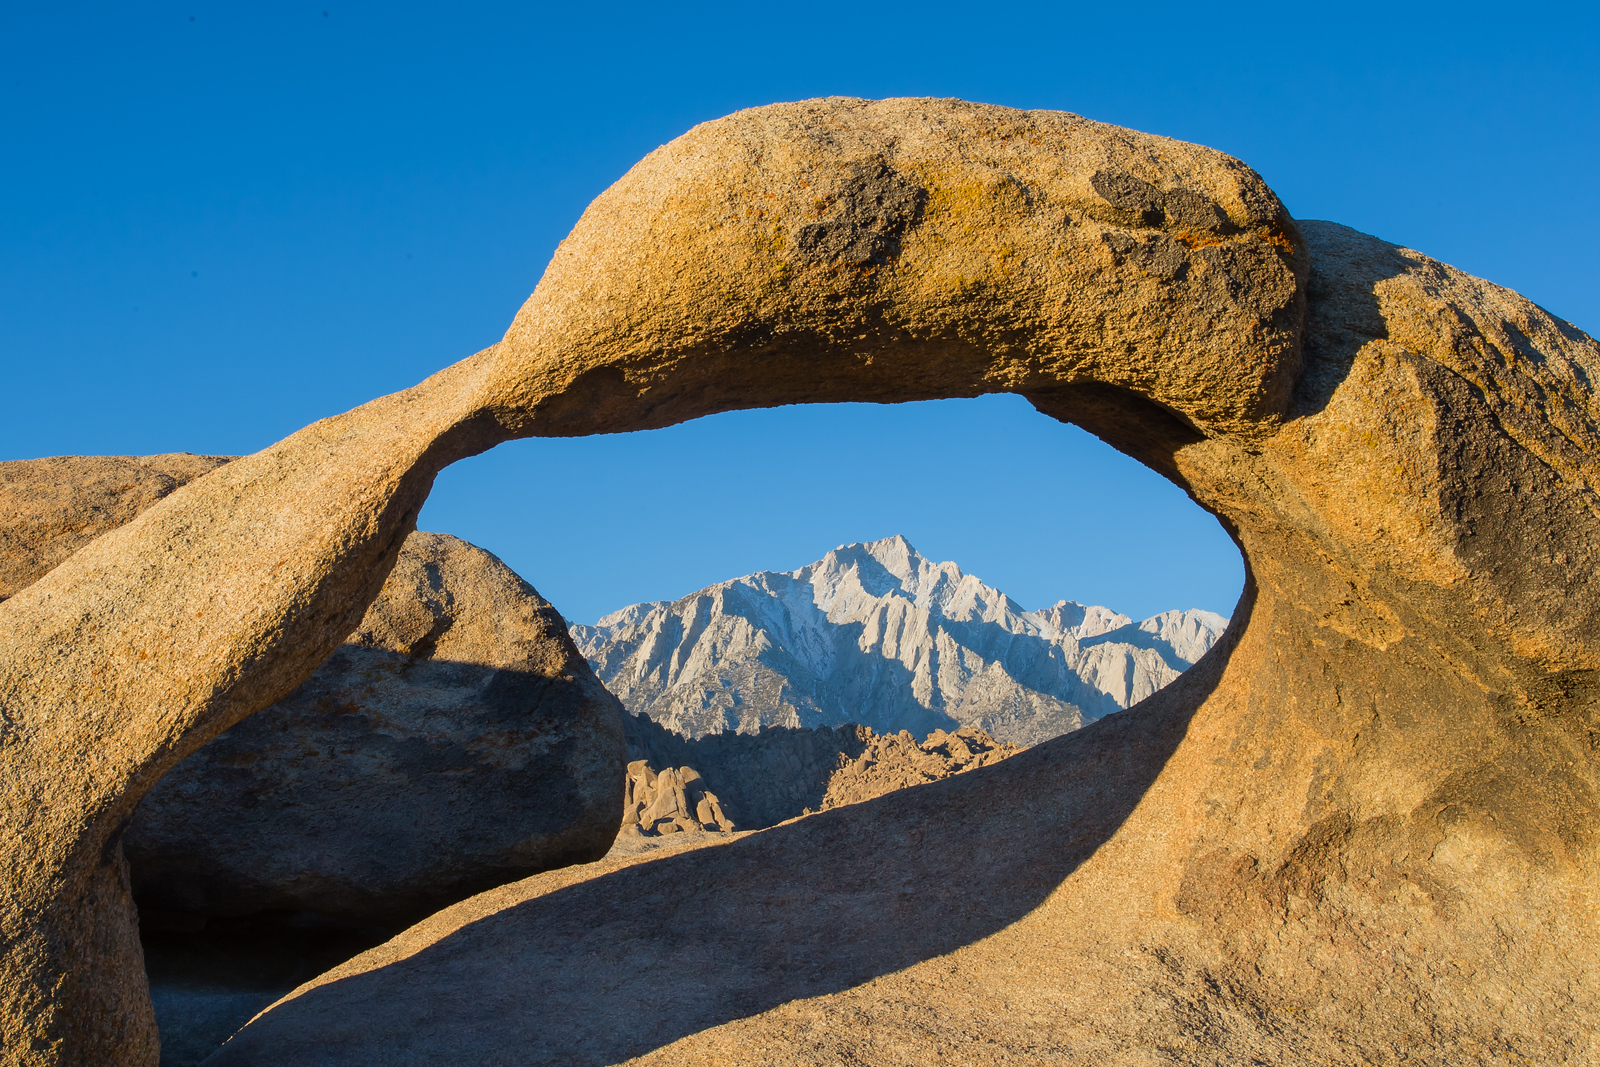 Cathedral peak  through Mobius Arch - Lone Pine, CA, USA